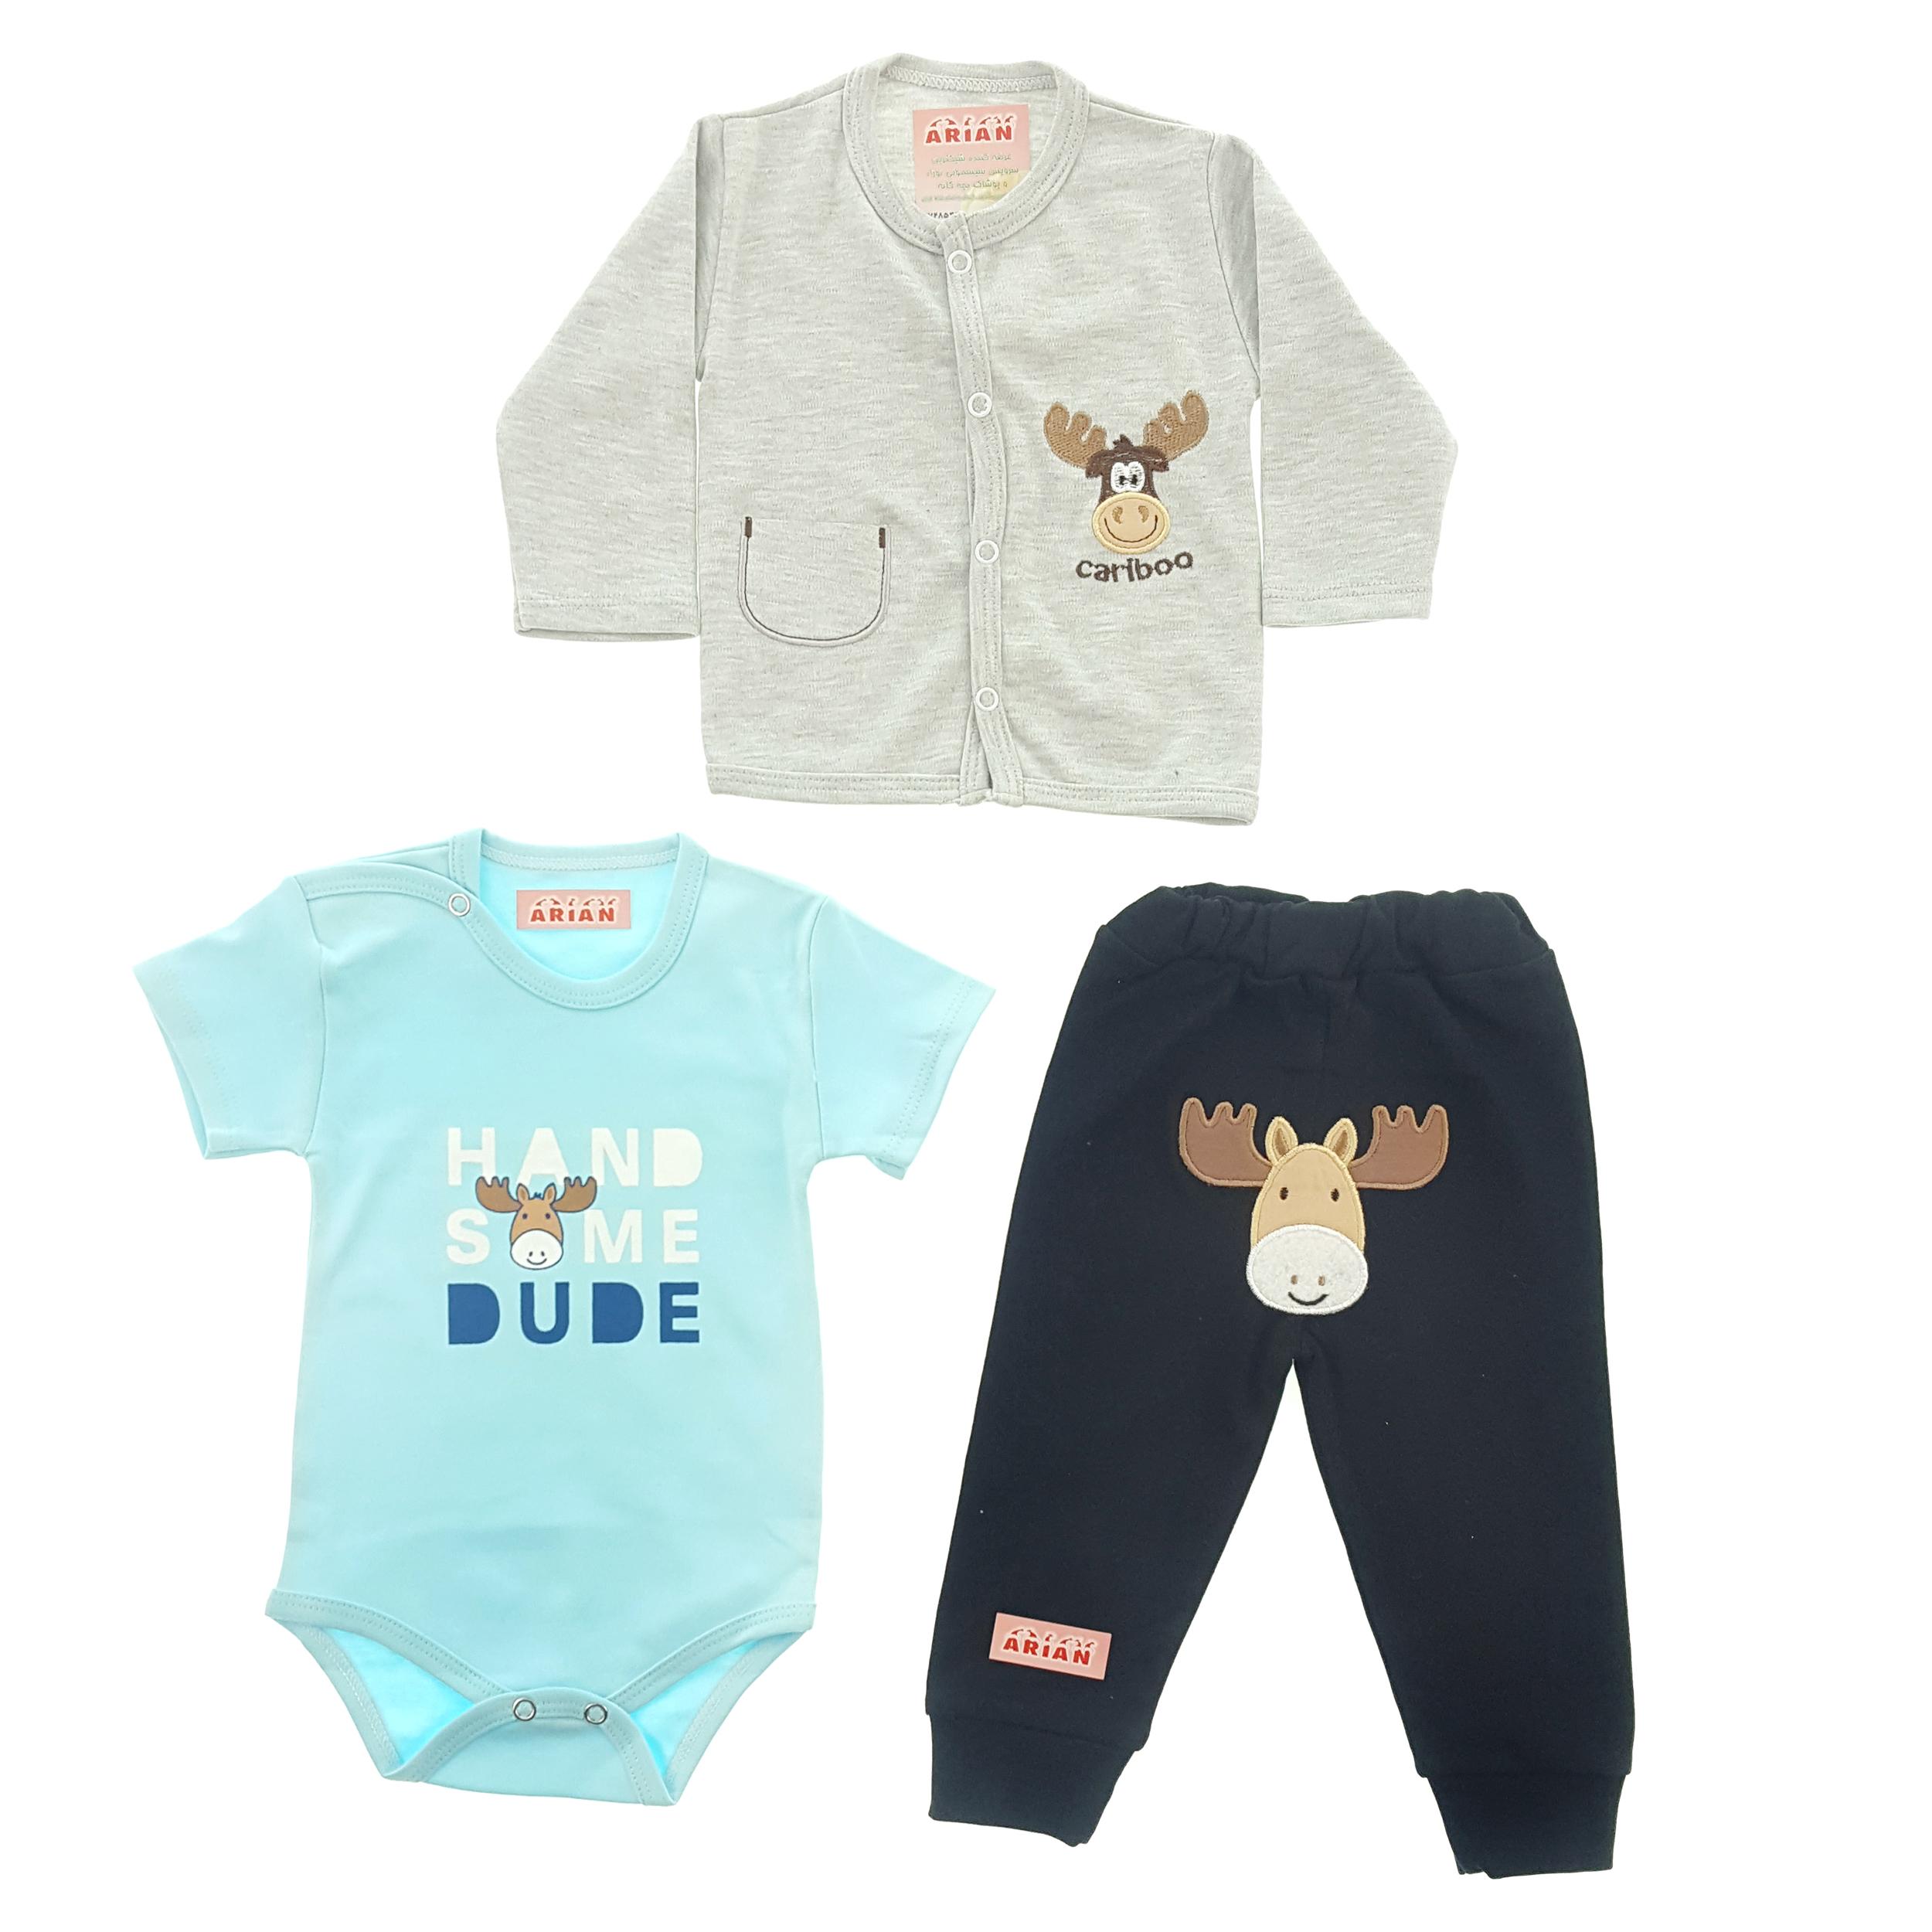 ست 3 تکه لباس نوزادی پسرانه  طرح گوزن کد t77285493   _ 989567ii18